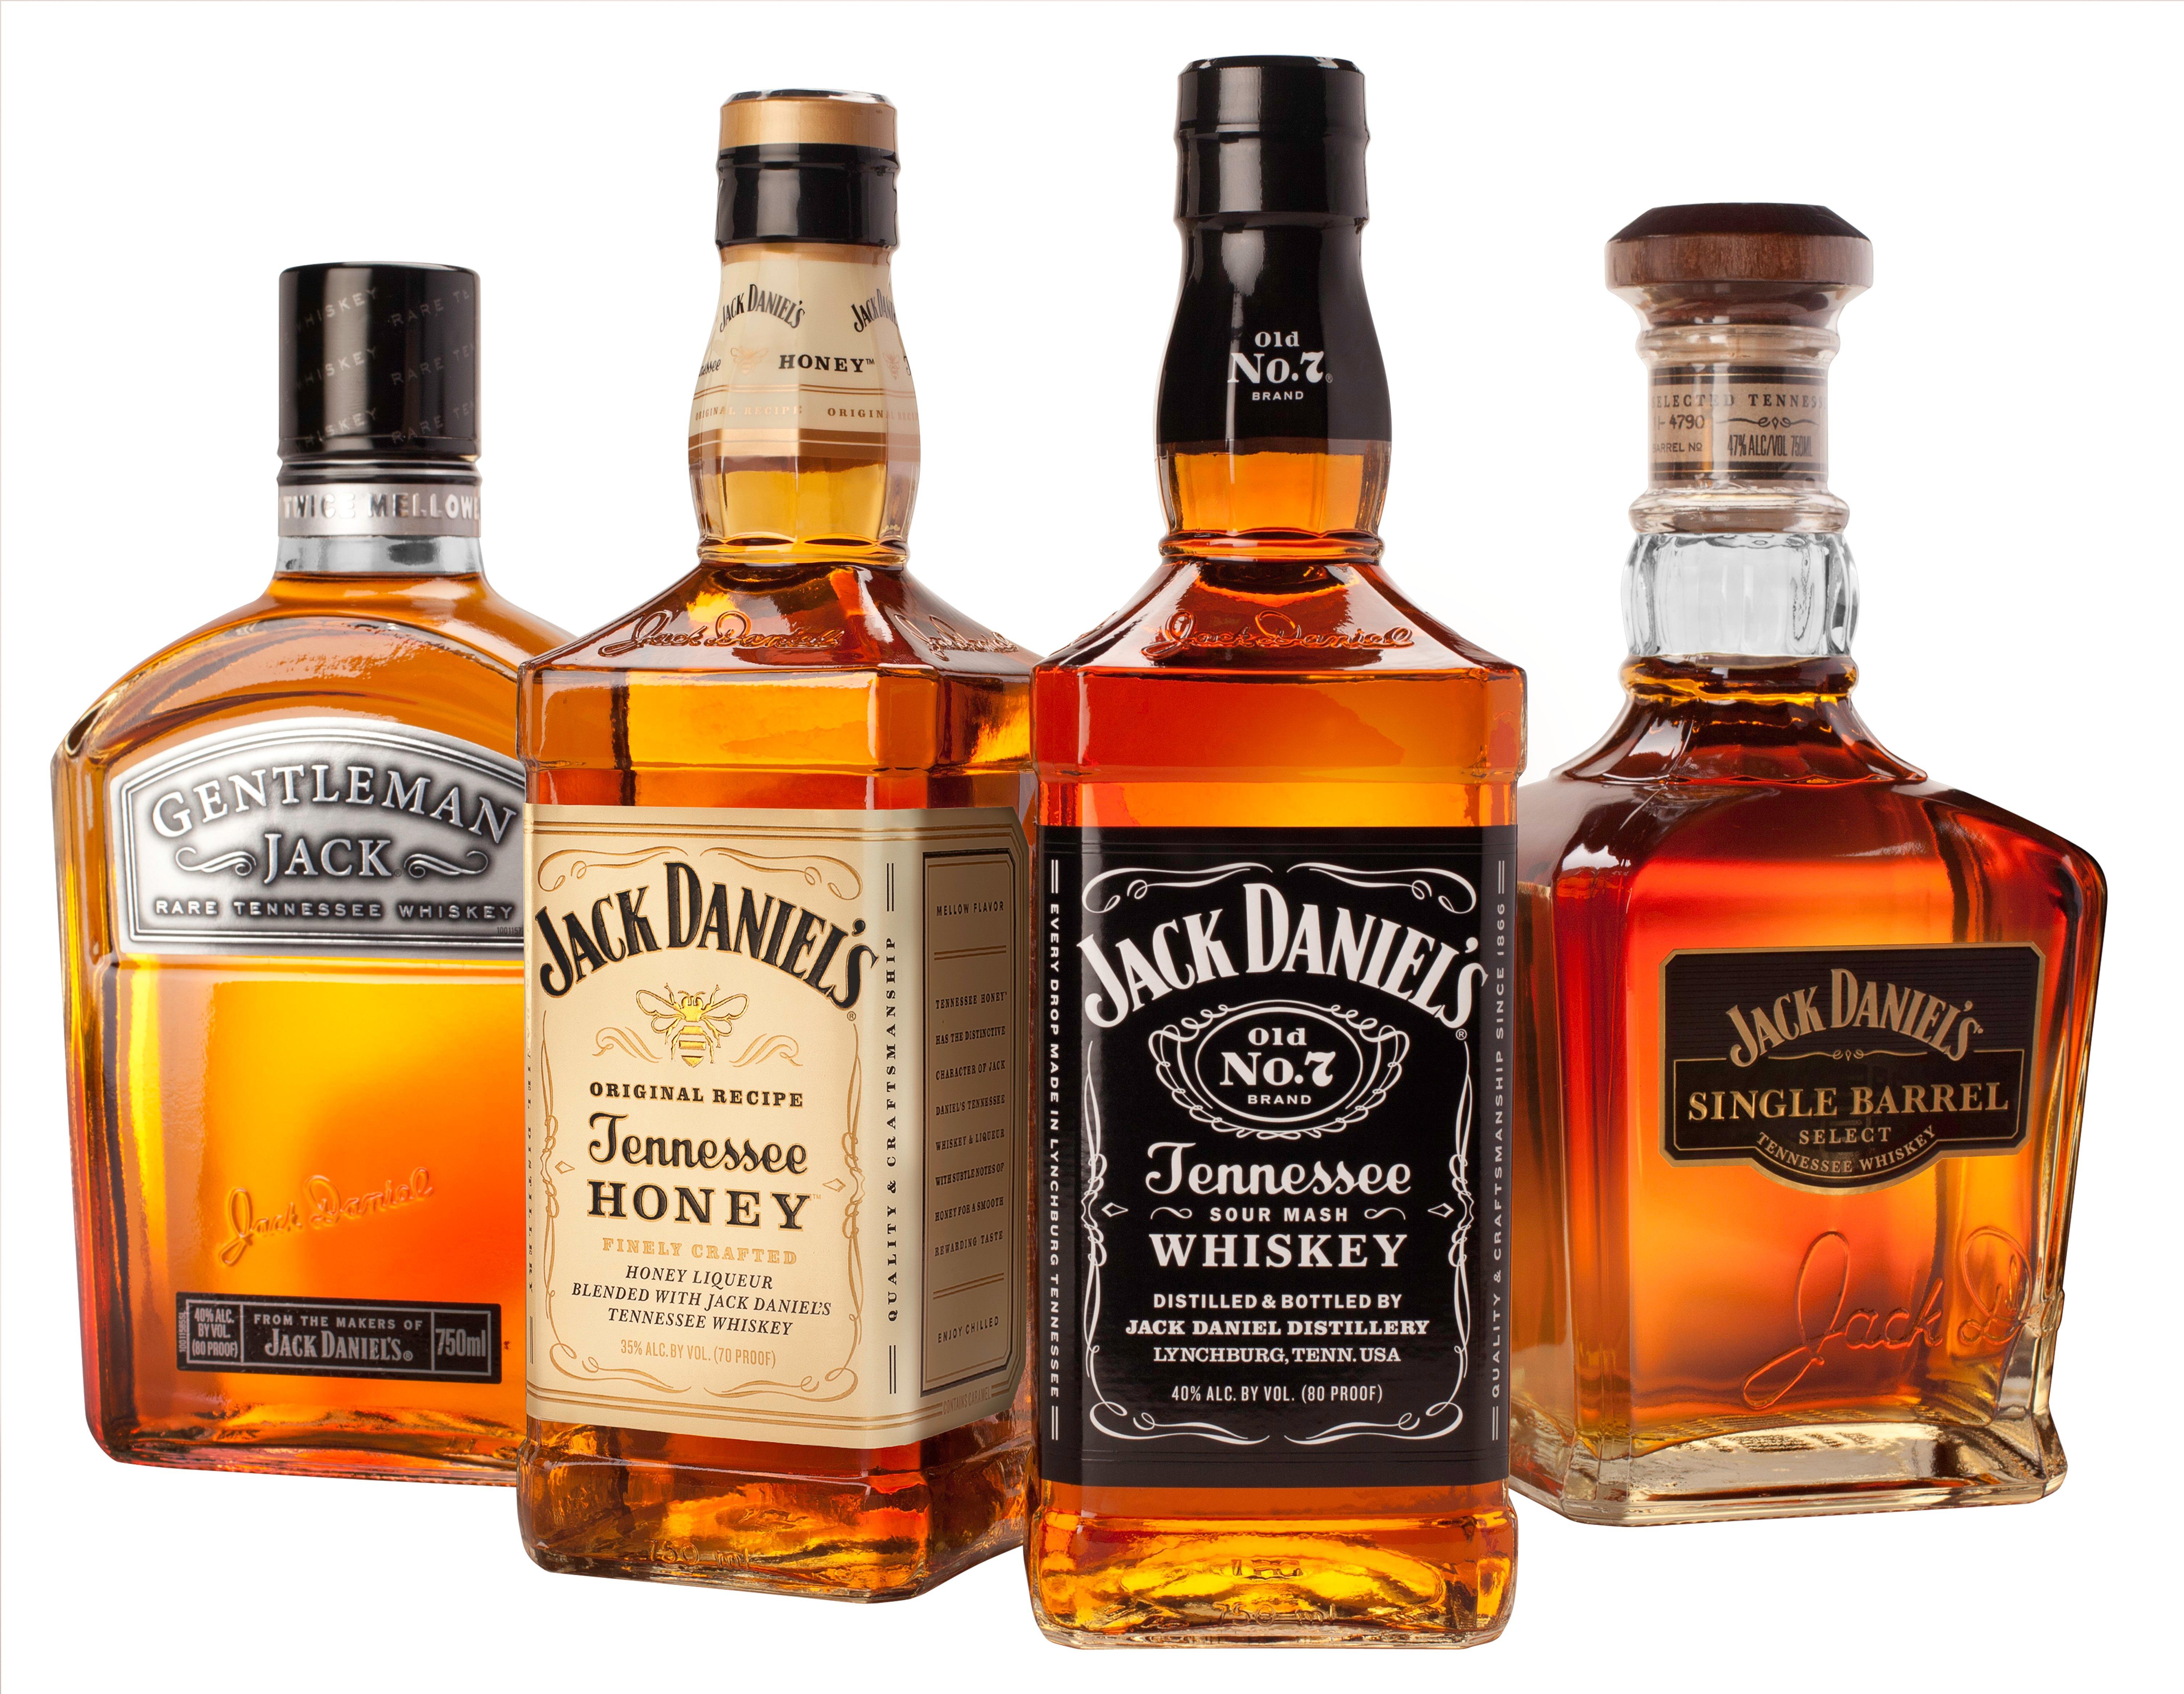 The Jack Daniel's family of brands